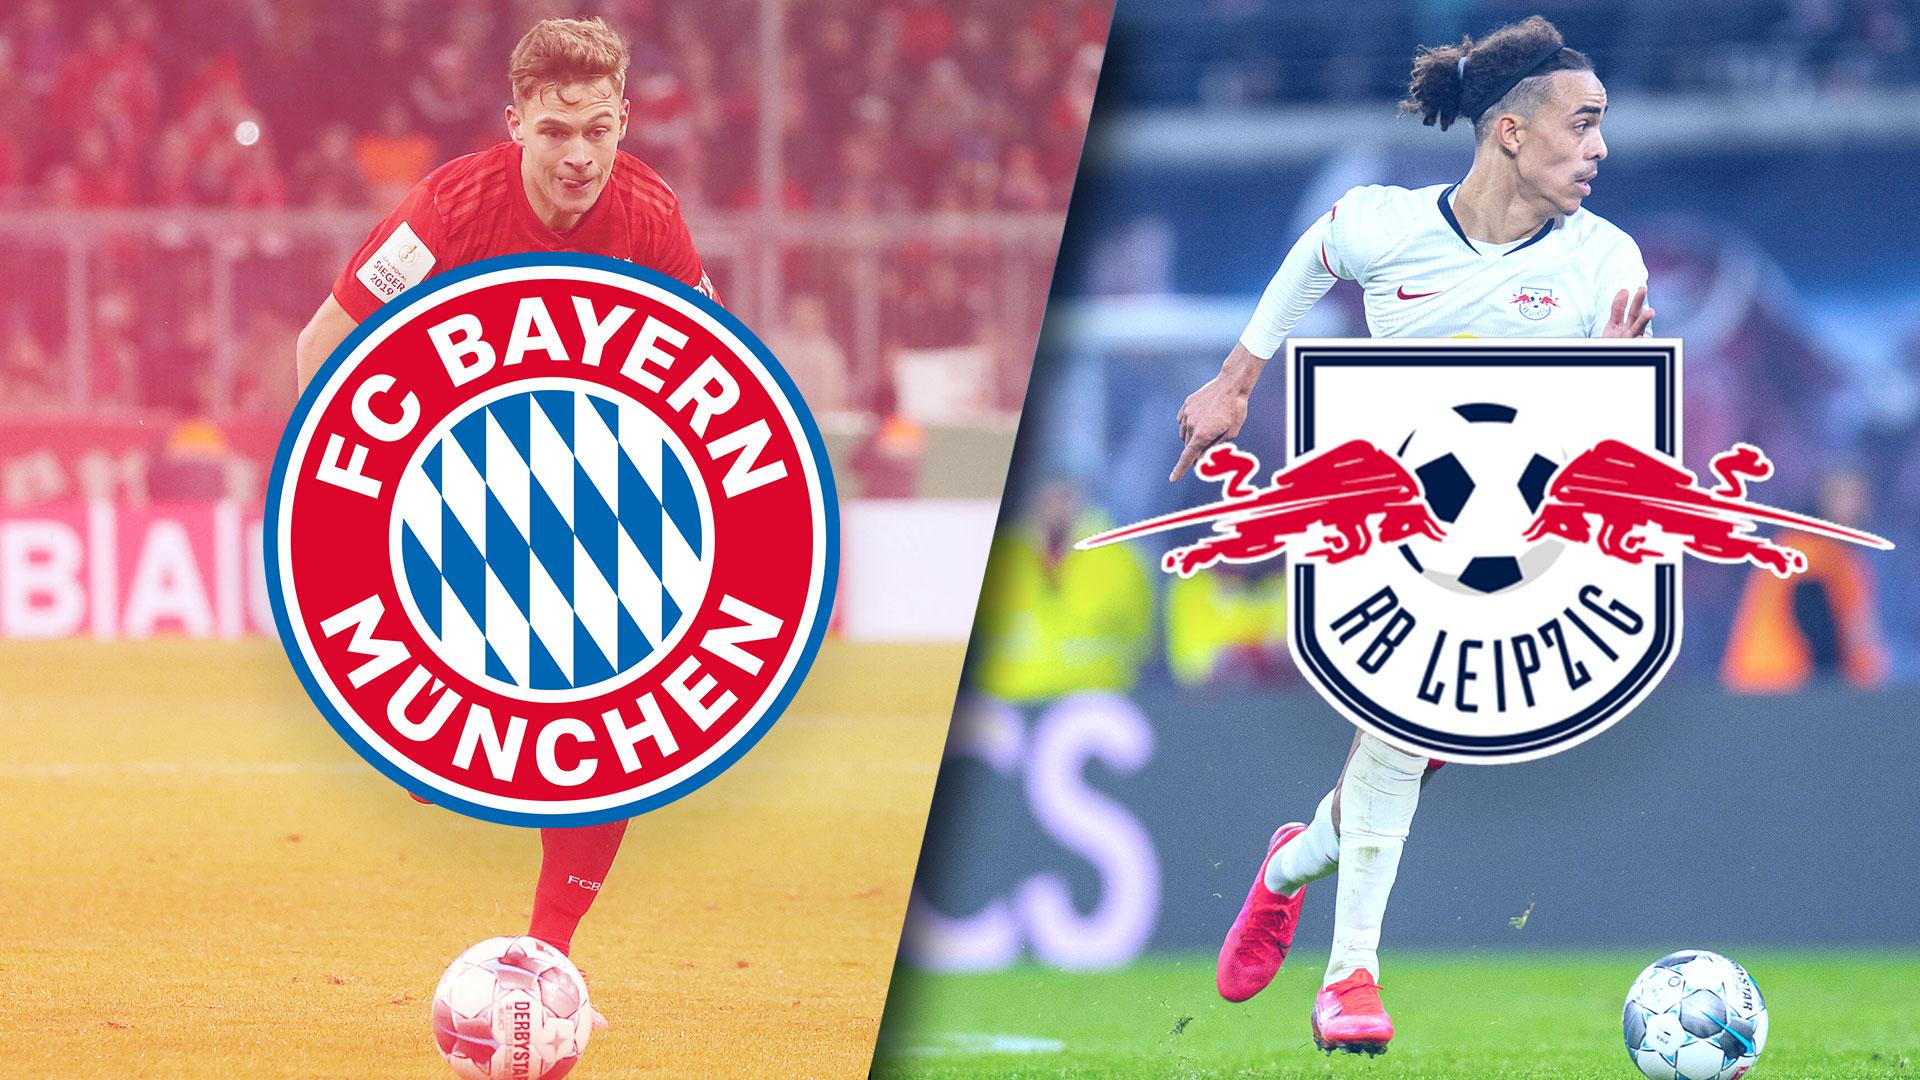 Bayern Munich bị RB Leipzig cầm hòa 3-3 tại Allianz Arena